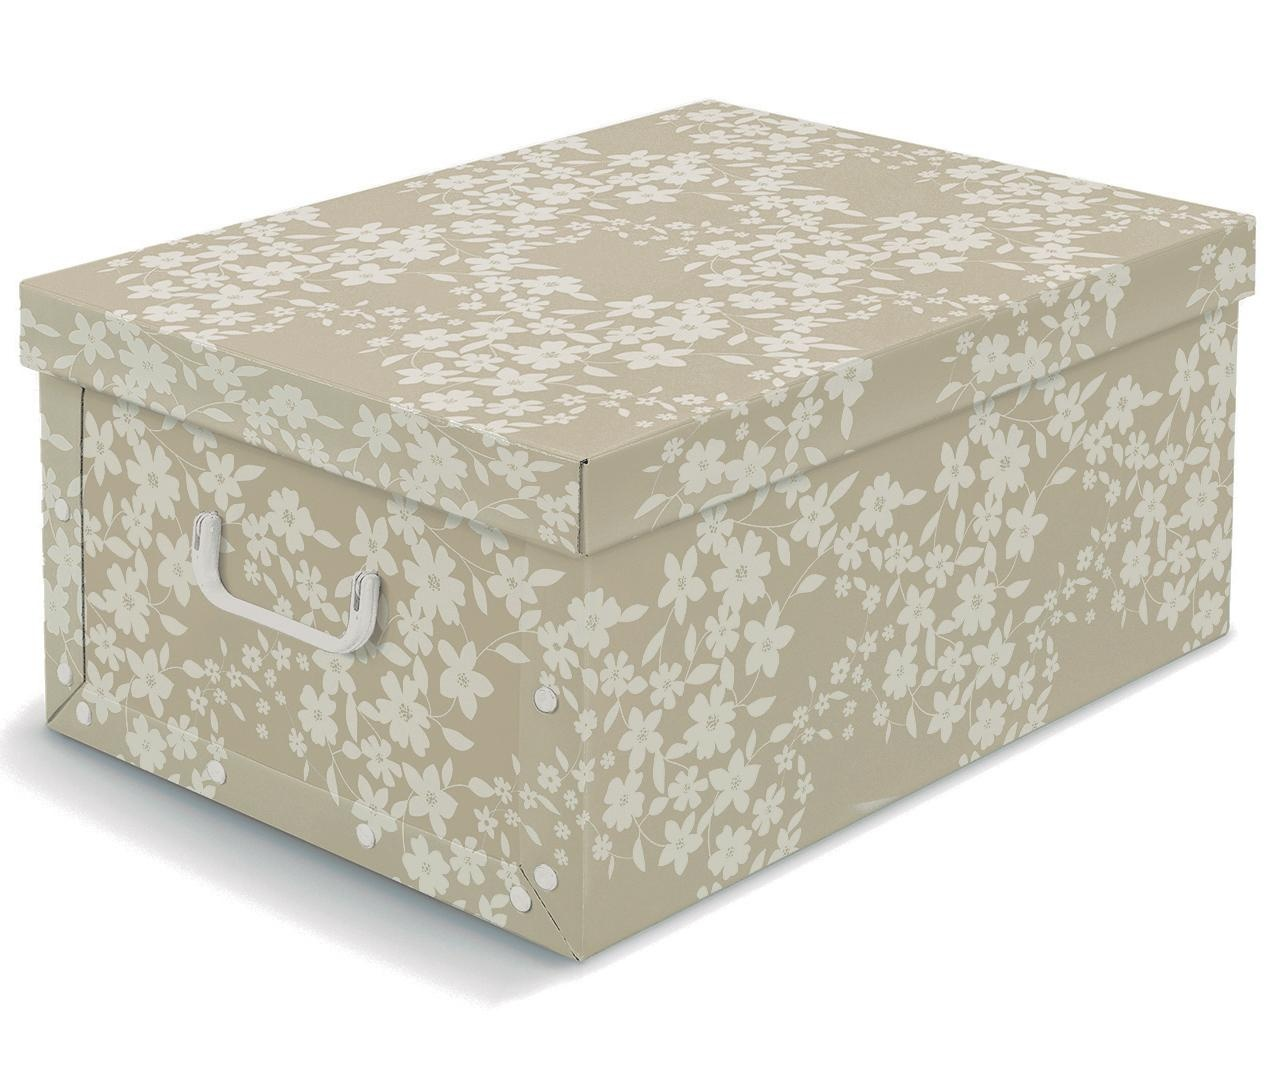 Cutie cu capac pentru depozitare Spring Beige L